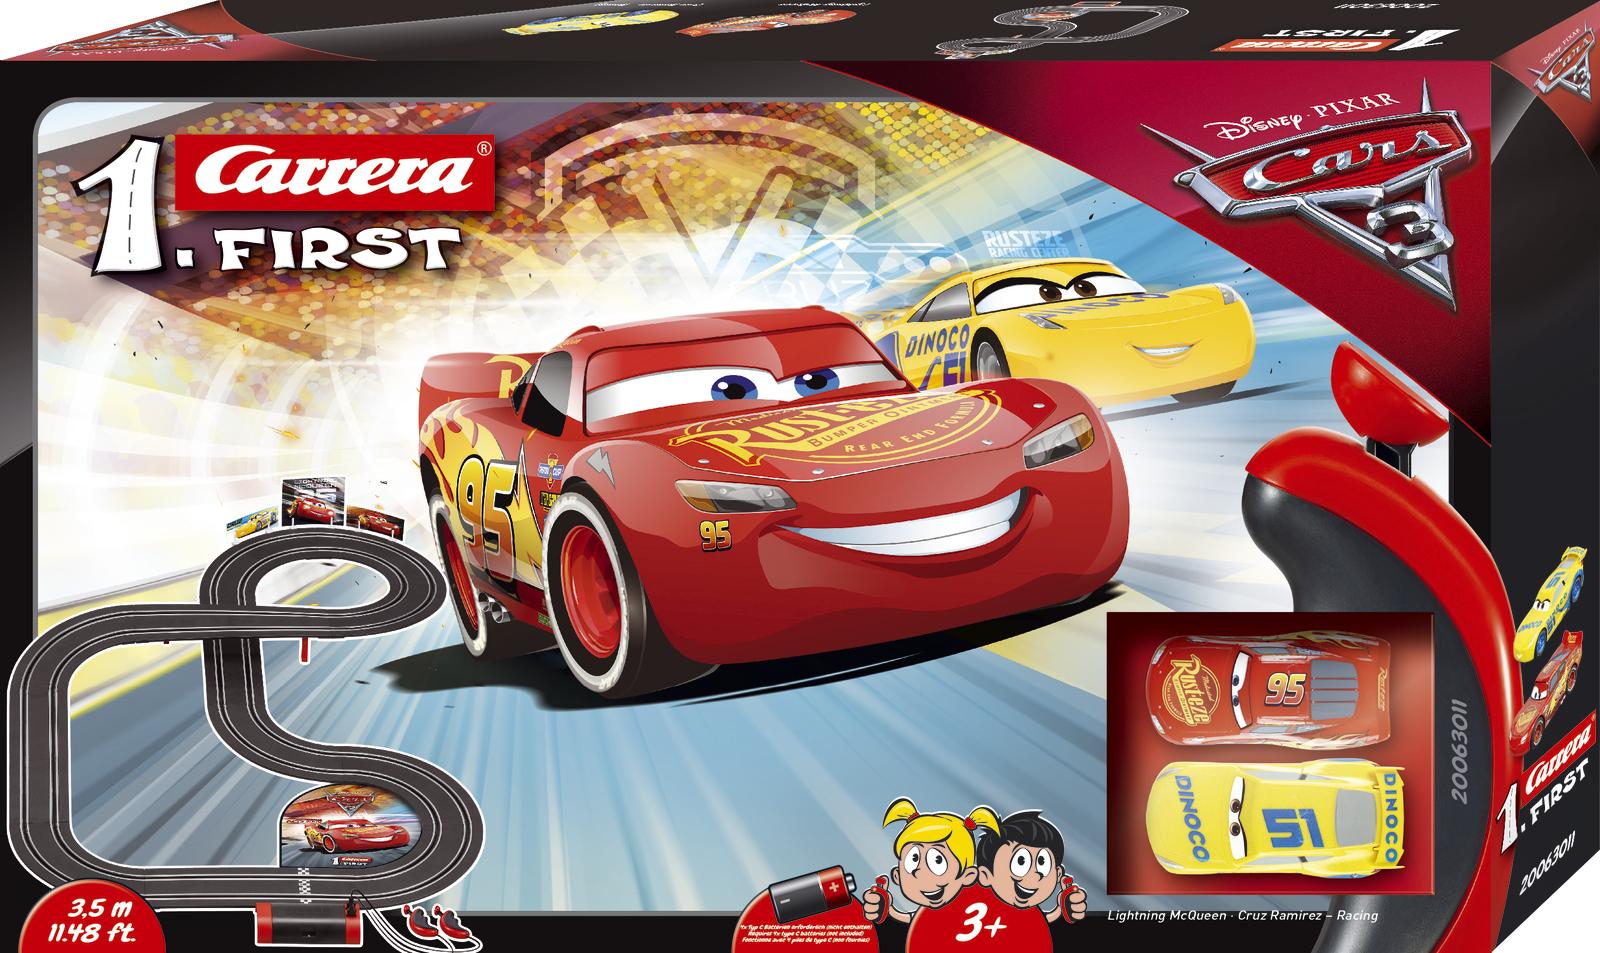 Carrera First: Disney Cars 3 - Slot Car Set #2 image